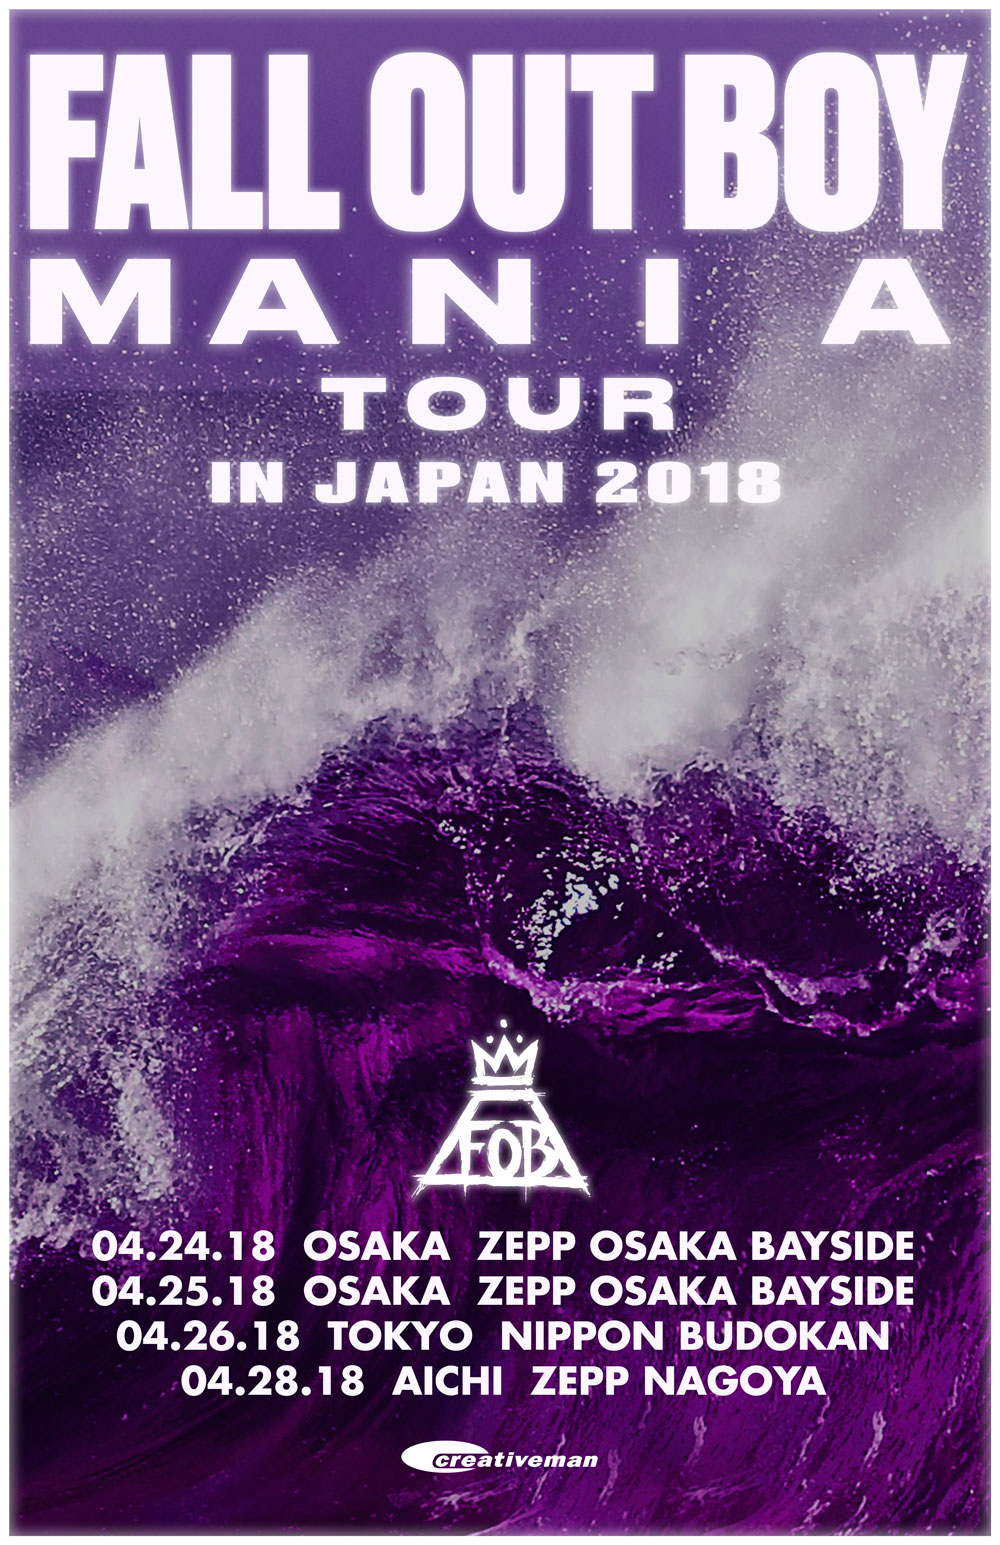 Tour of Japan Admat.jpg